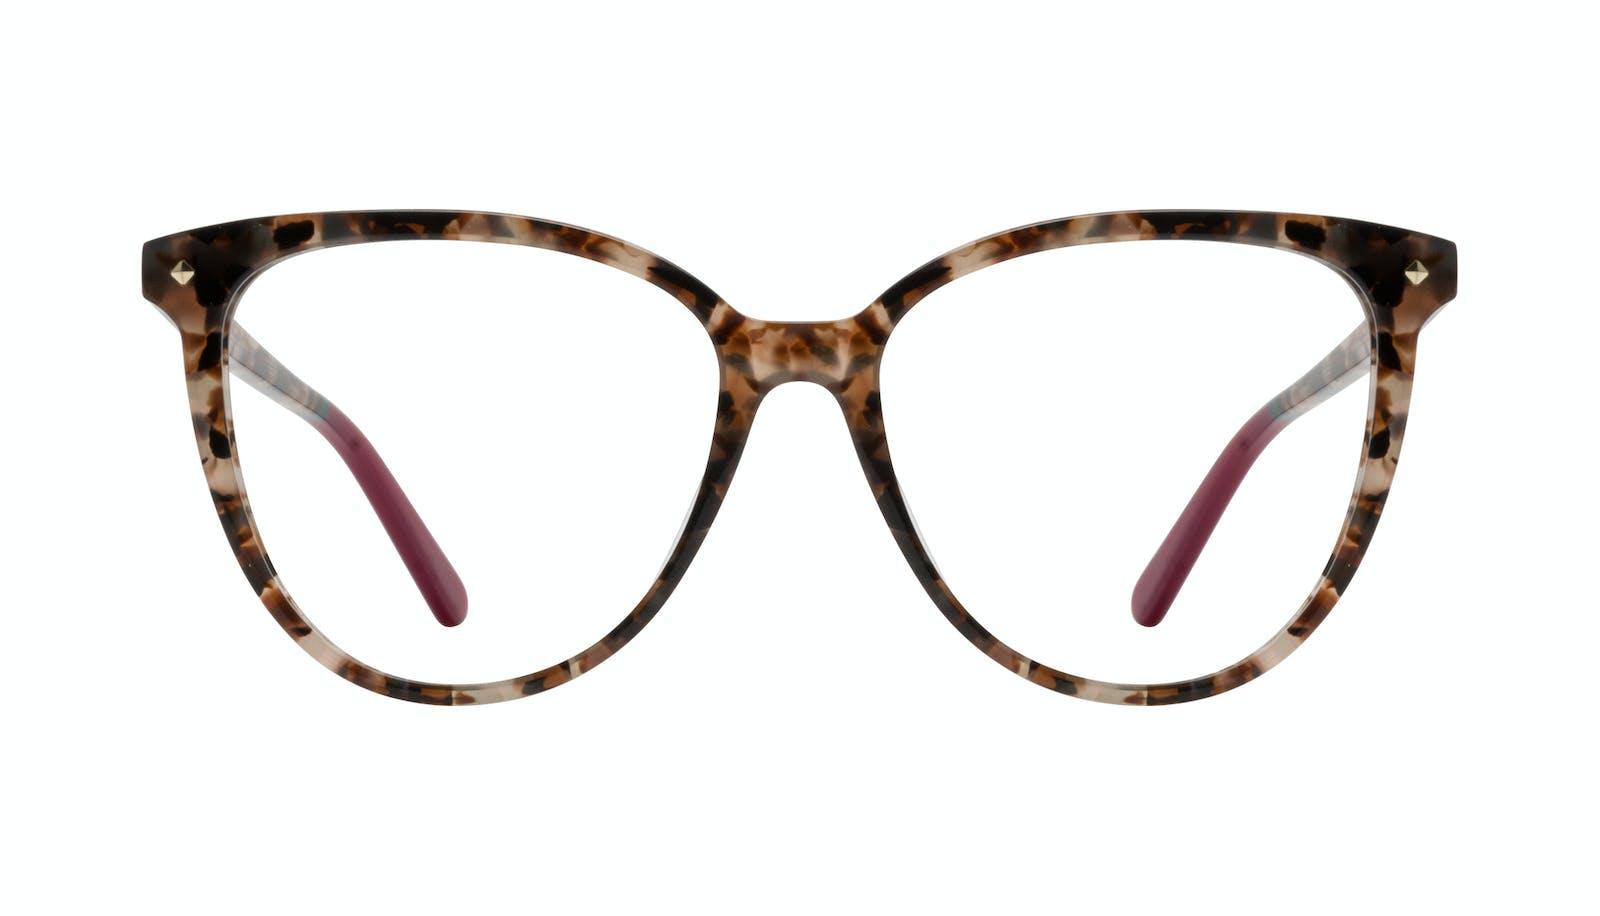 7ecc537e4a Affordable Fashion Glasses Cat Eye Eyeglasses Women Jane Pink Tortoise